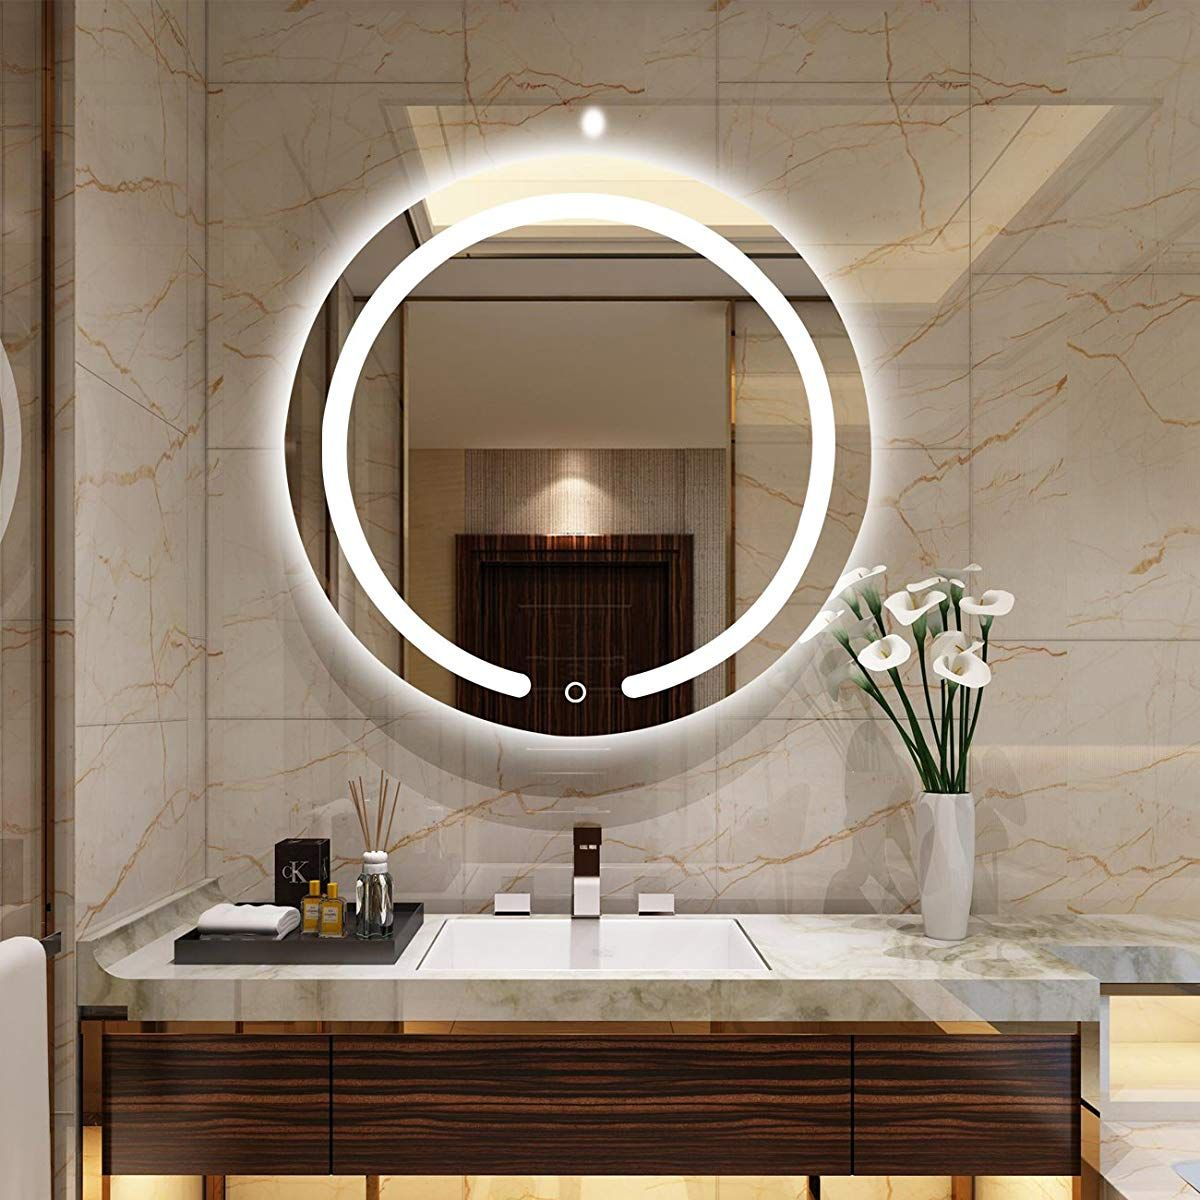 Bathroom Mirrors Wall Round Waterproof Led Backlight Wall Makeup Mirror Bathroom Mirror Dressing Mirror Led Mirror Bathroom Dressing Mirror Bathroom Mirror